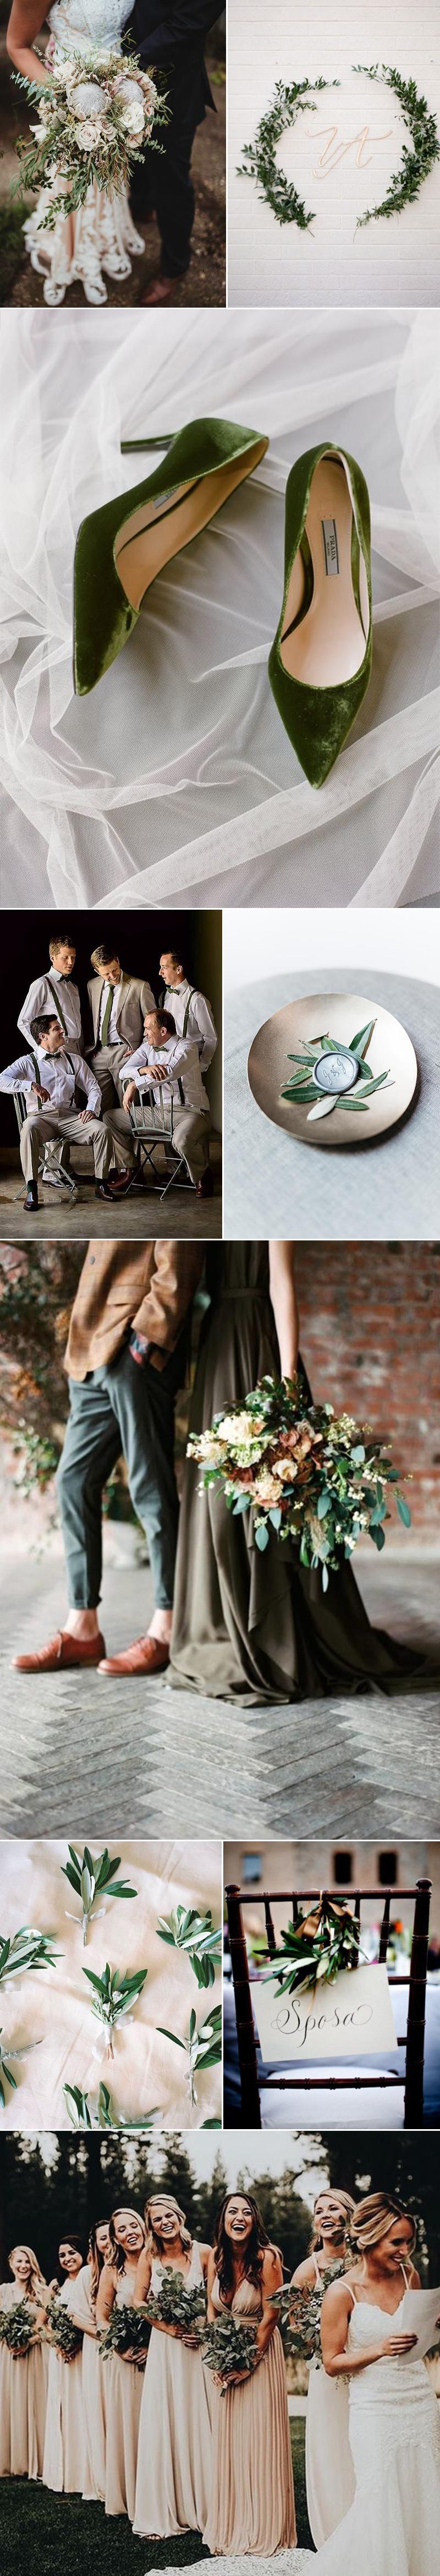 Stunning Wedding Ideas in Olive